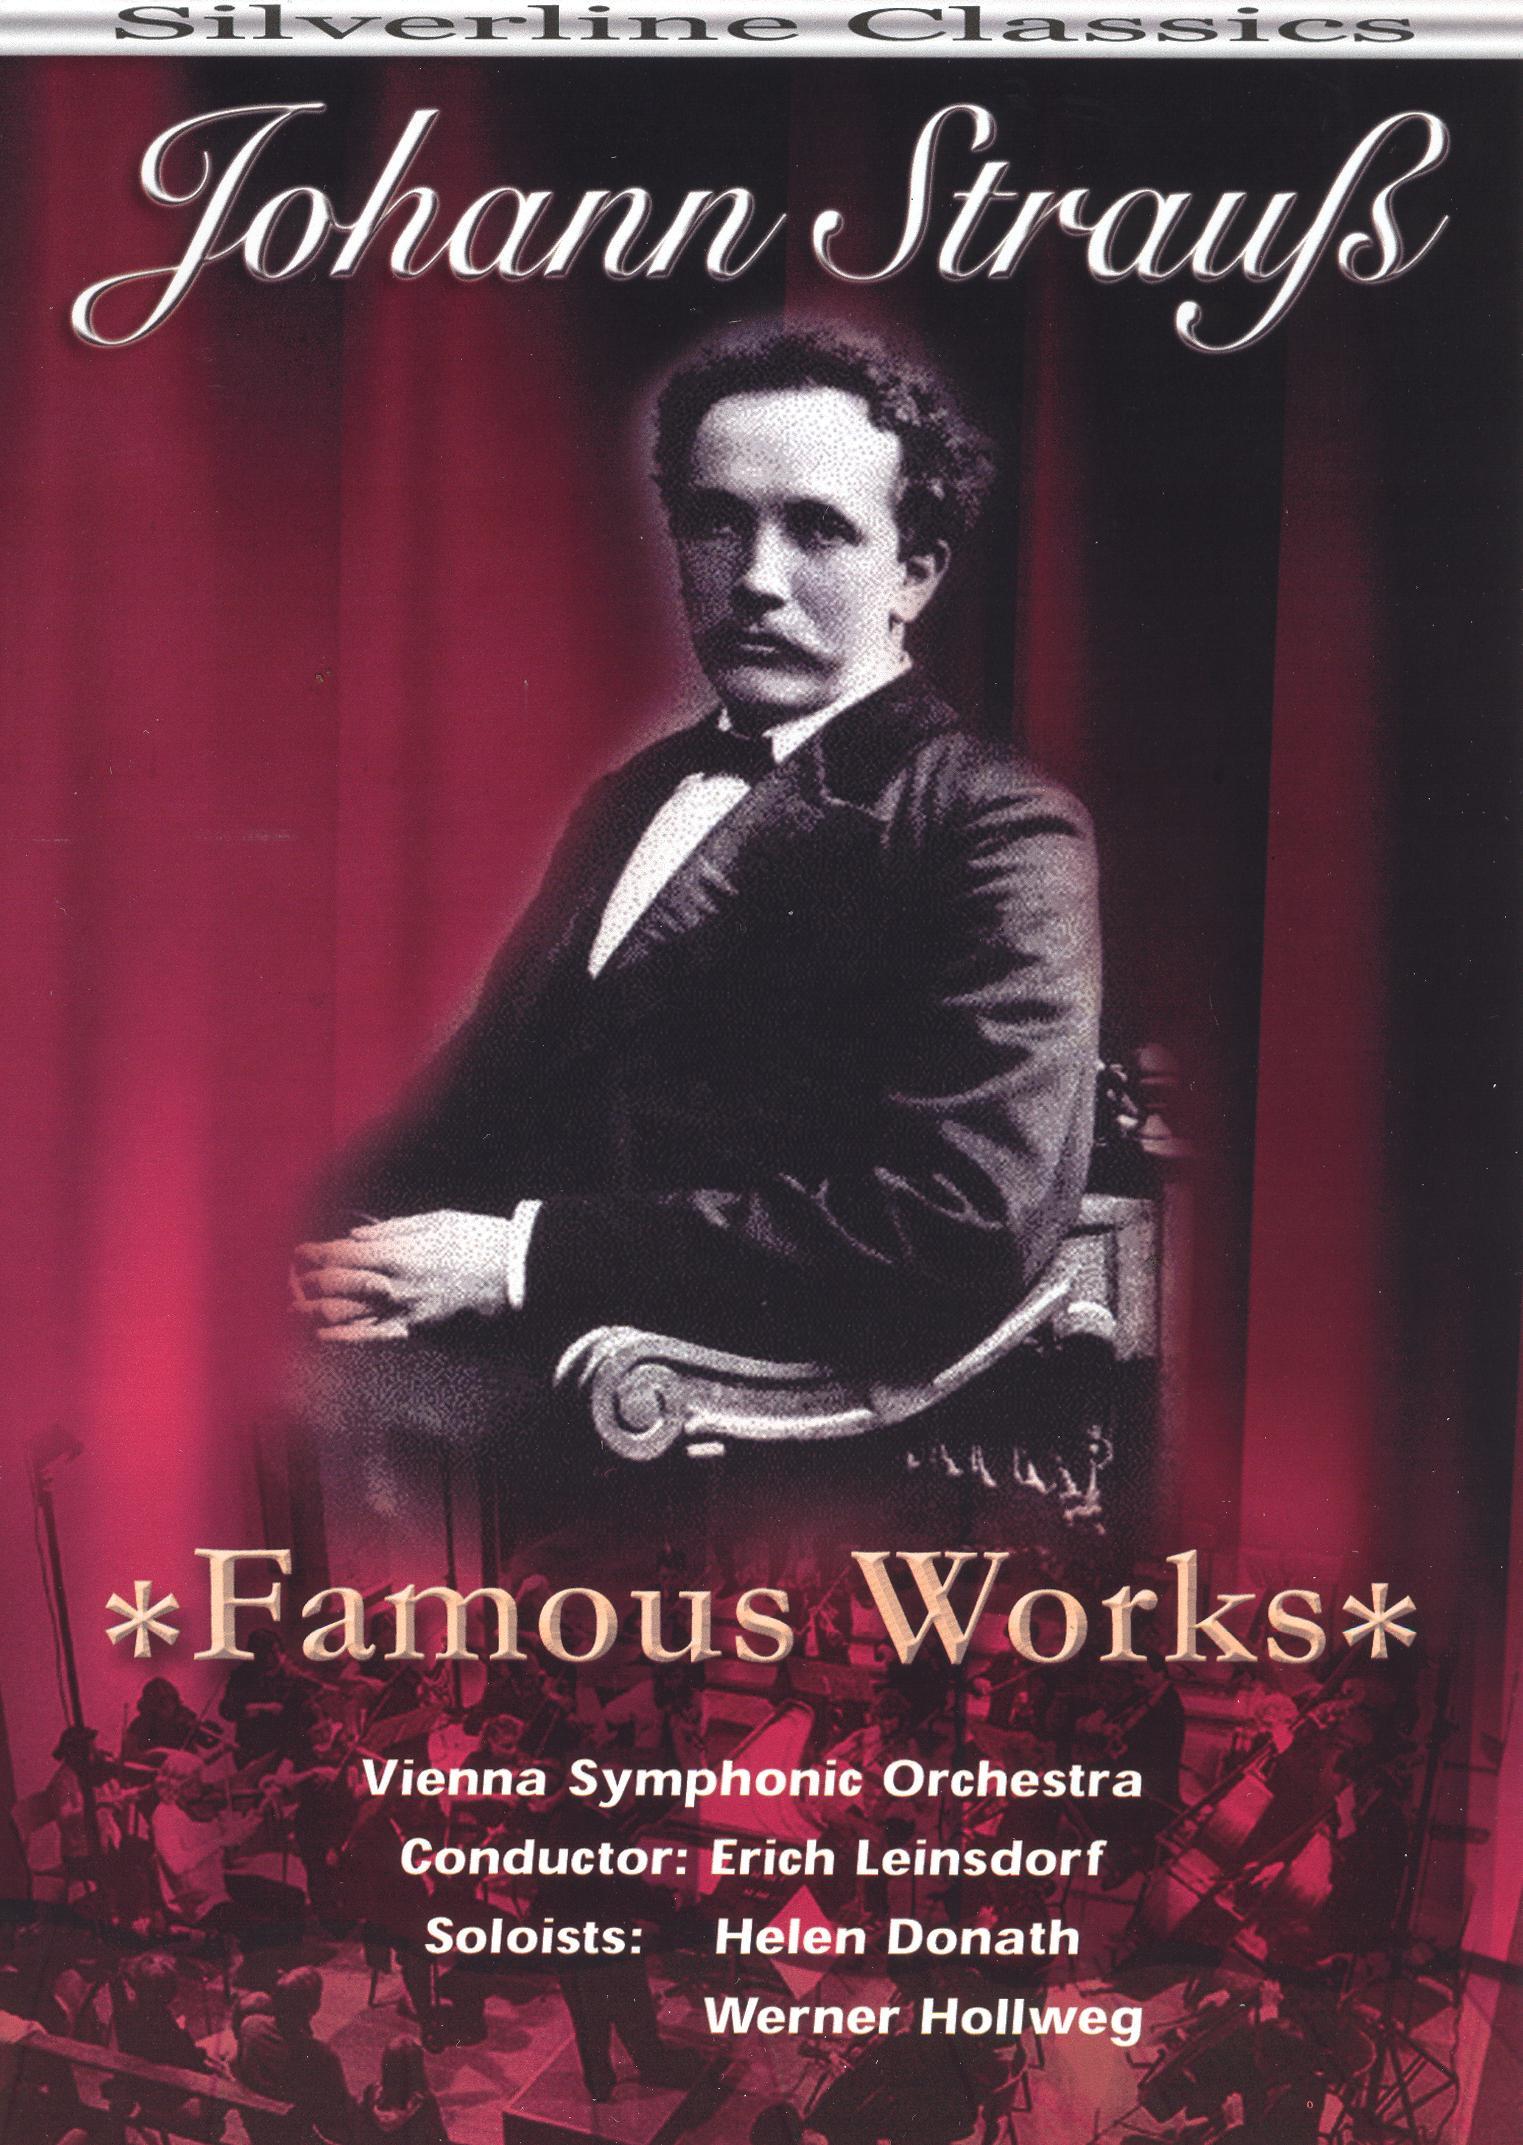 Vienna Symphonic Orchestra: Johann Strauss - Famous Works